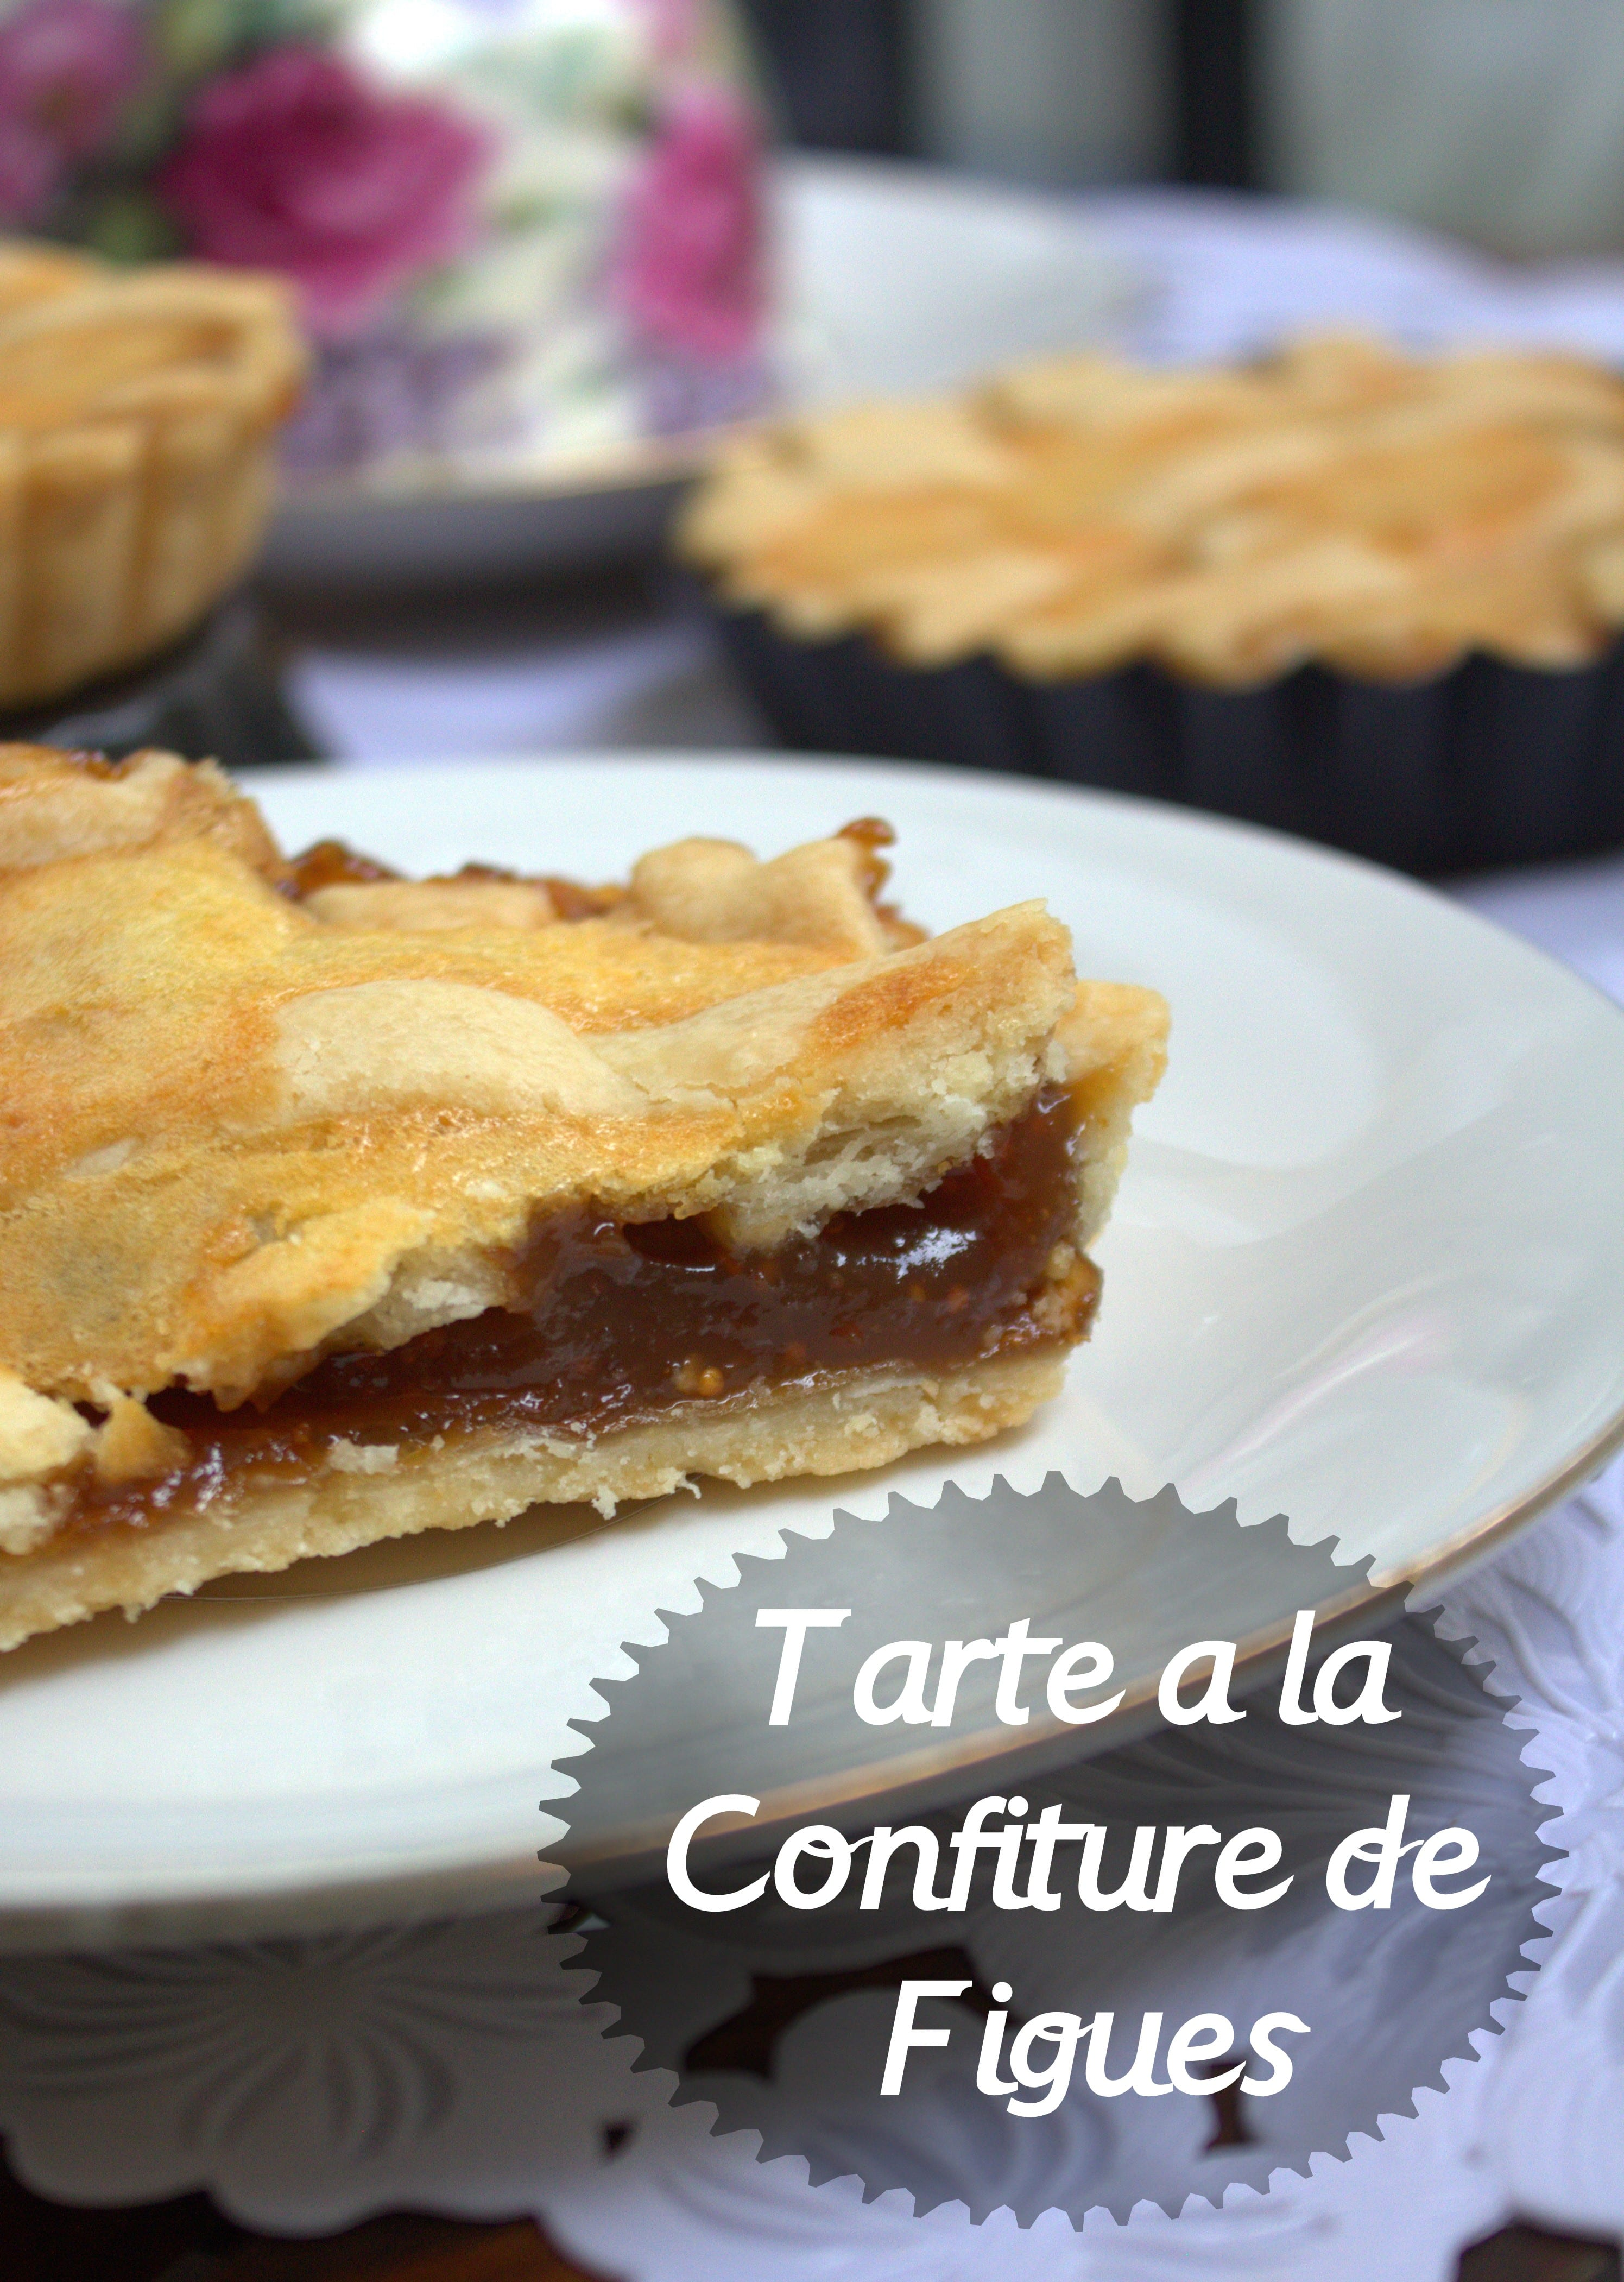 Tarte a la confiture de figues samira tv amour de cuisine for Amour de cuisine